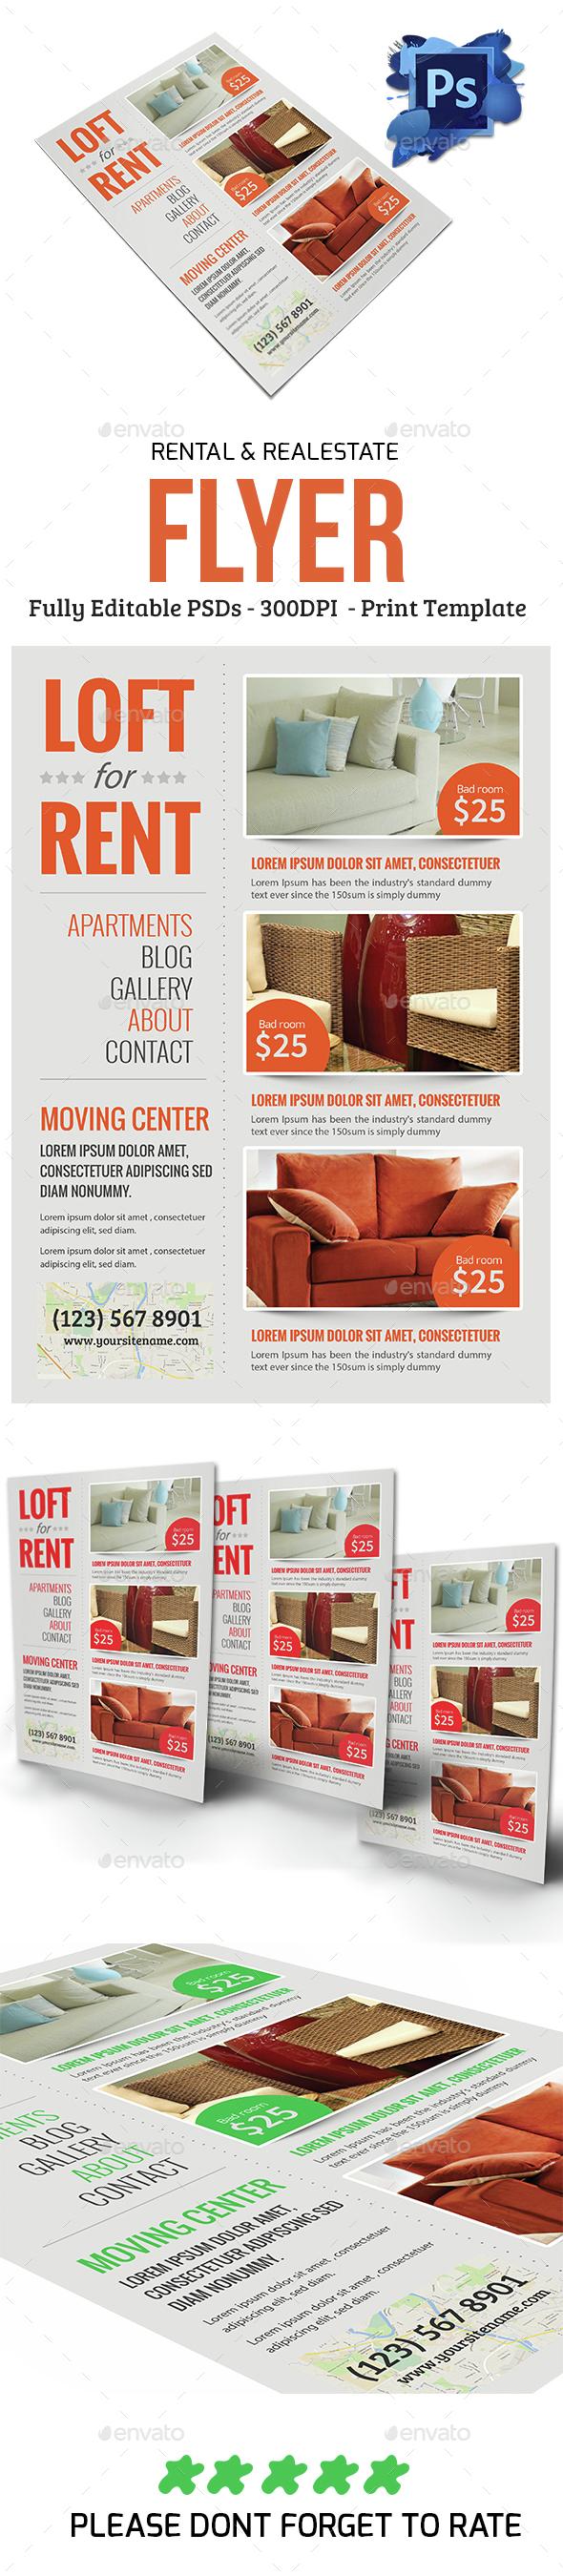 Real estate & Rental Flyer - Flyers Print Templates